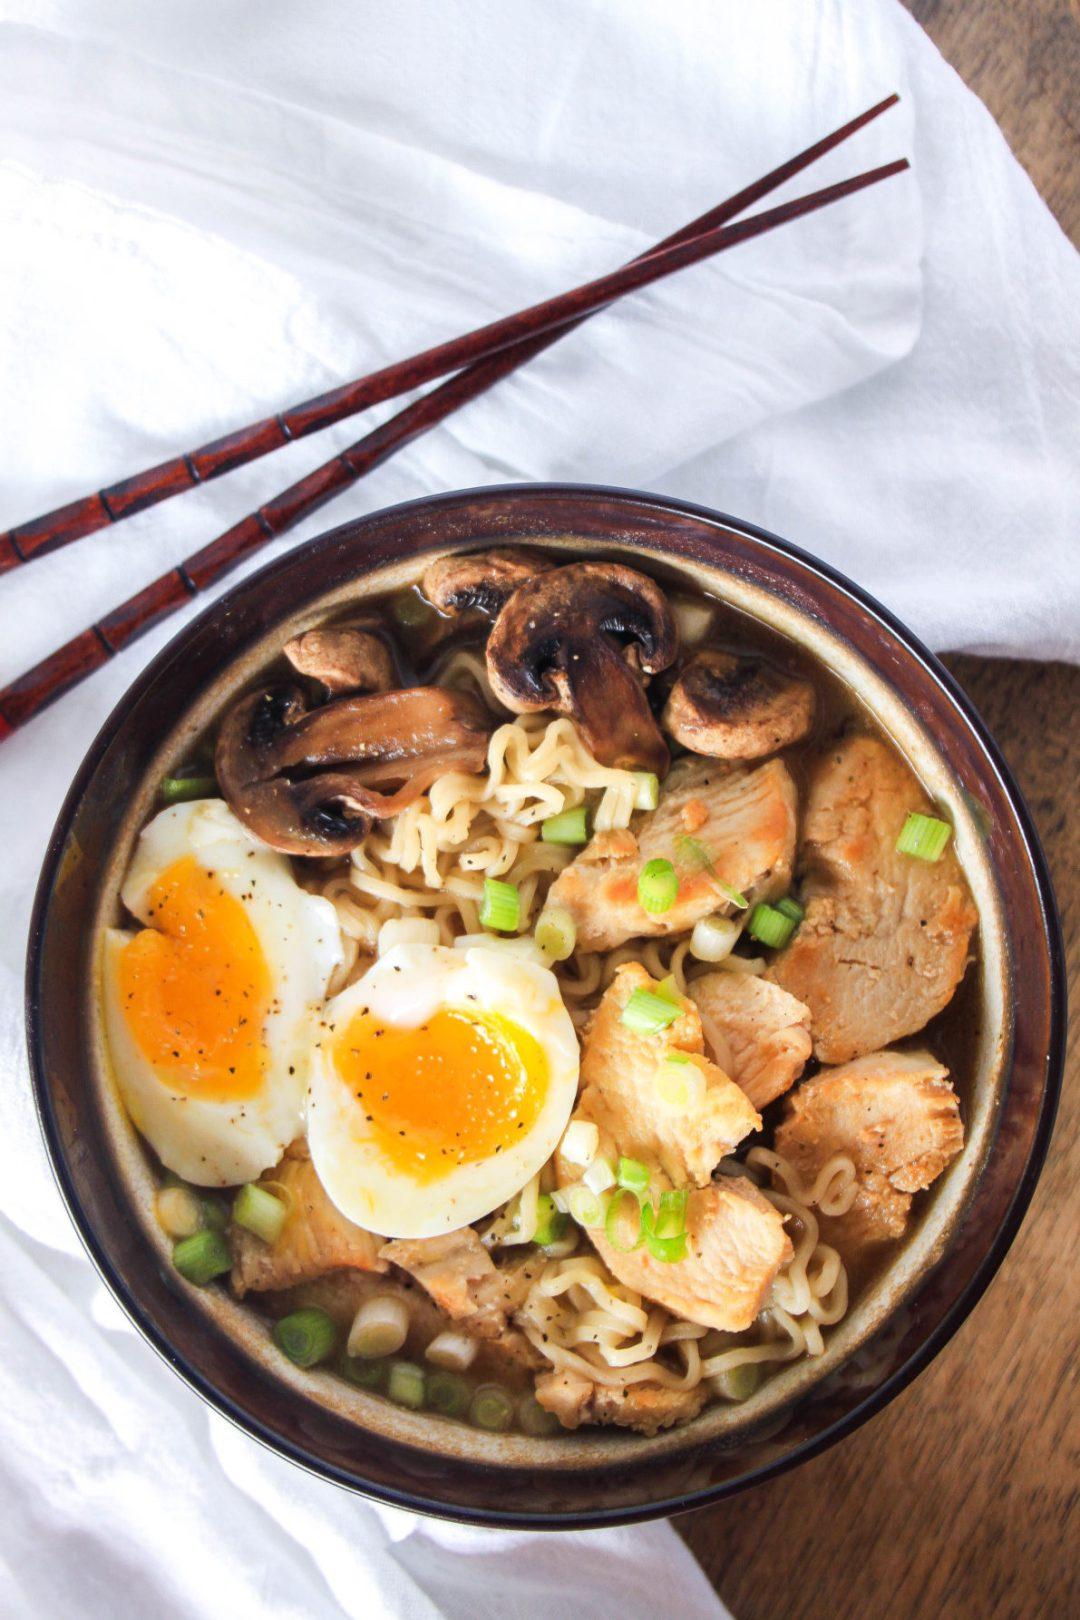 30 Days of Healthy Chicken Dinner Recipes - Japanese Ramen with Chicken via Wanderzest   https://www.roseclearfield.com